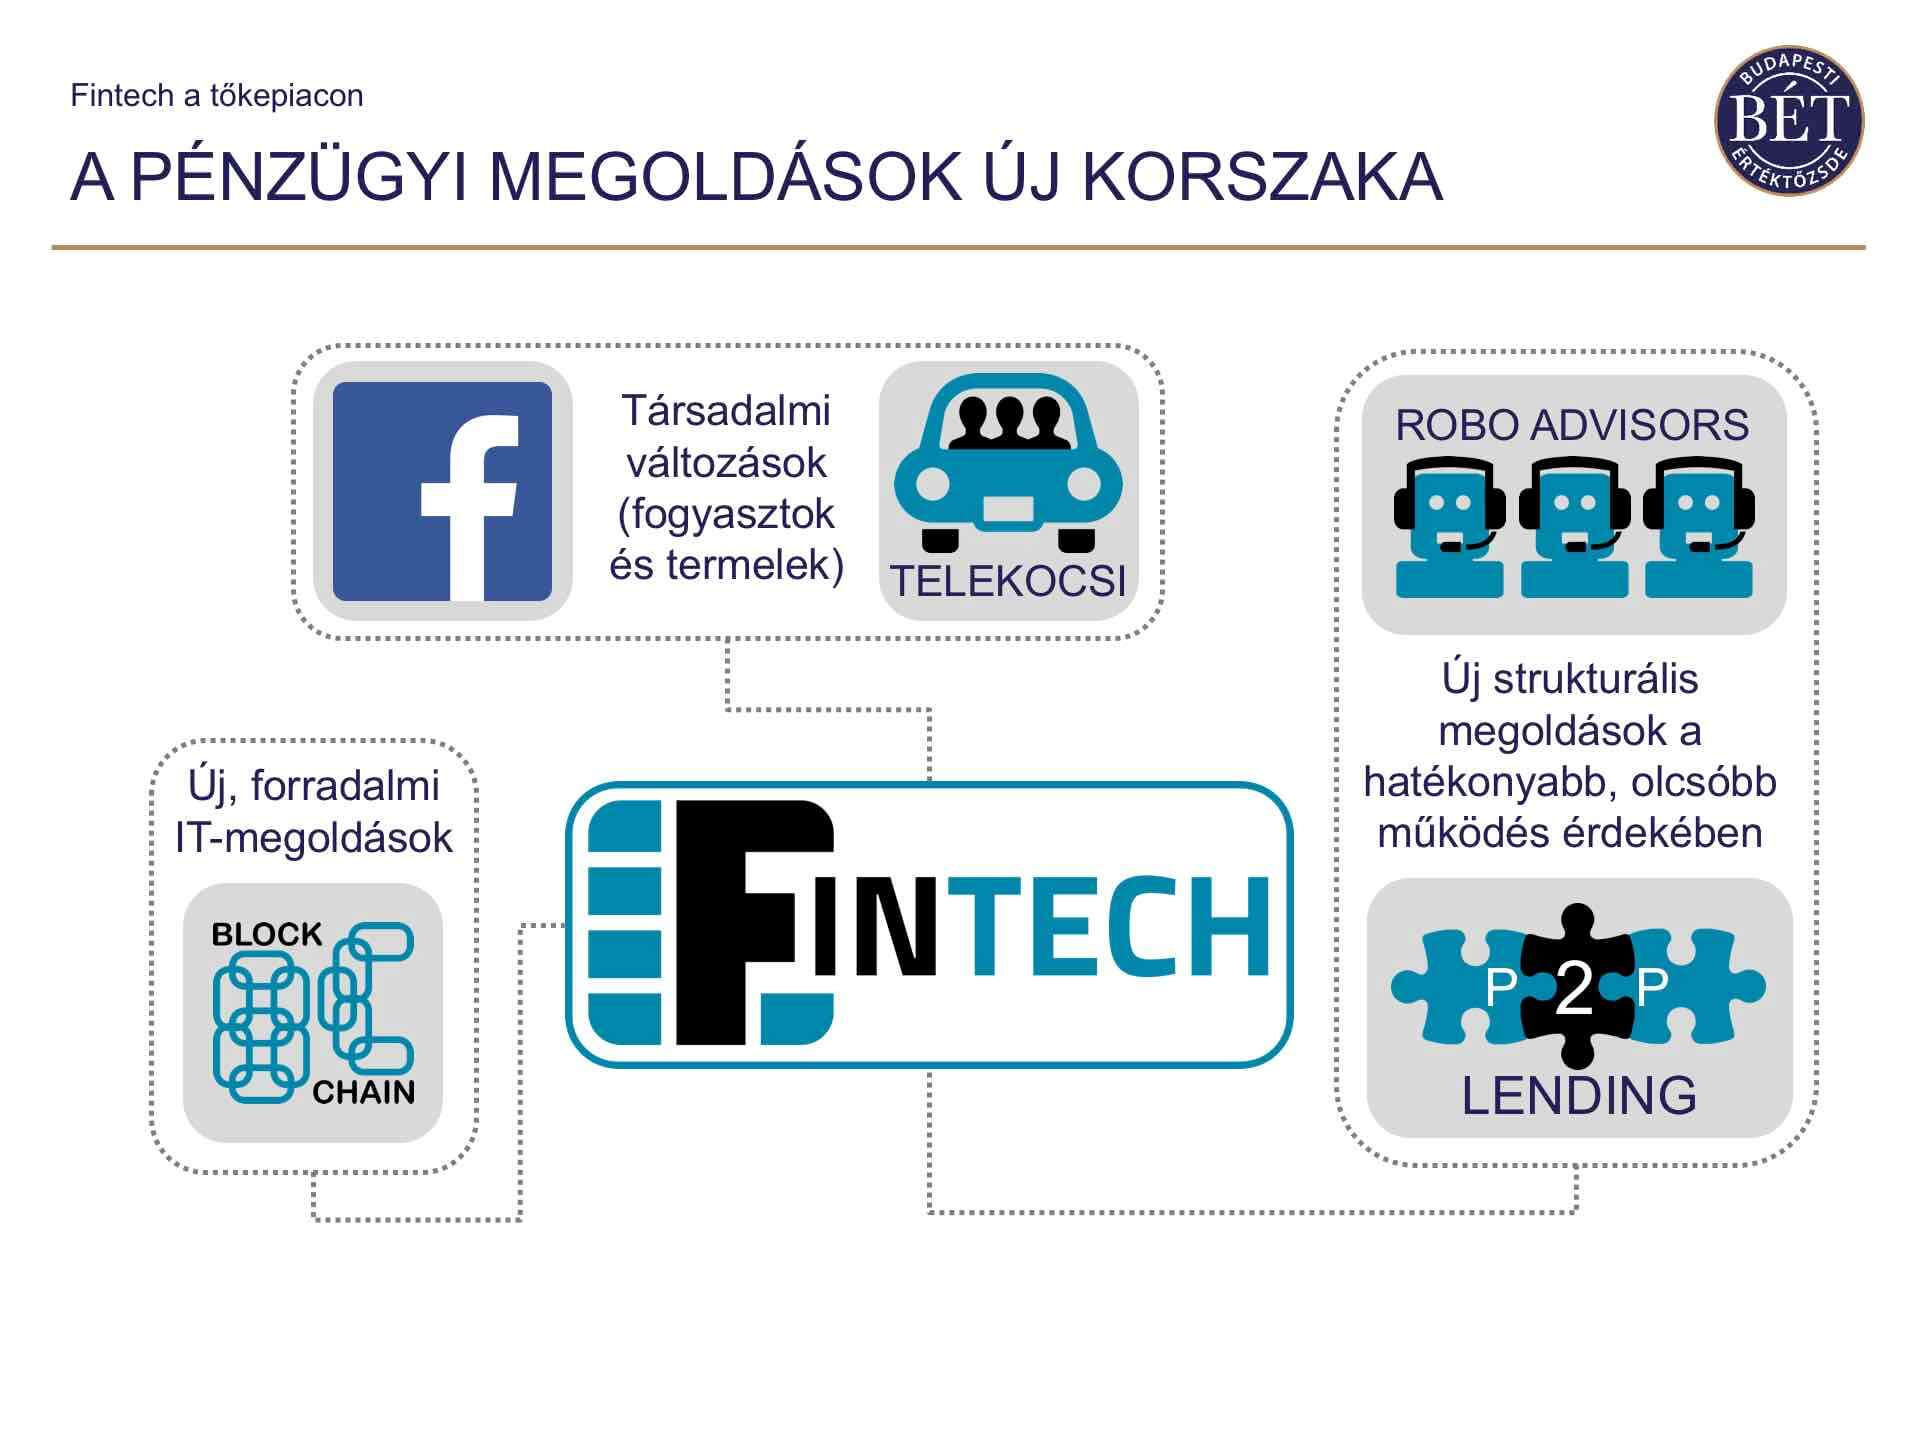 fintech akadémia BÉT crowdfunding